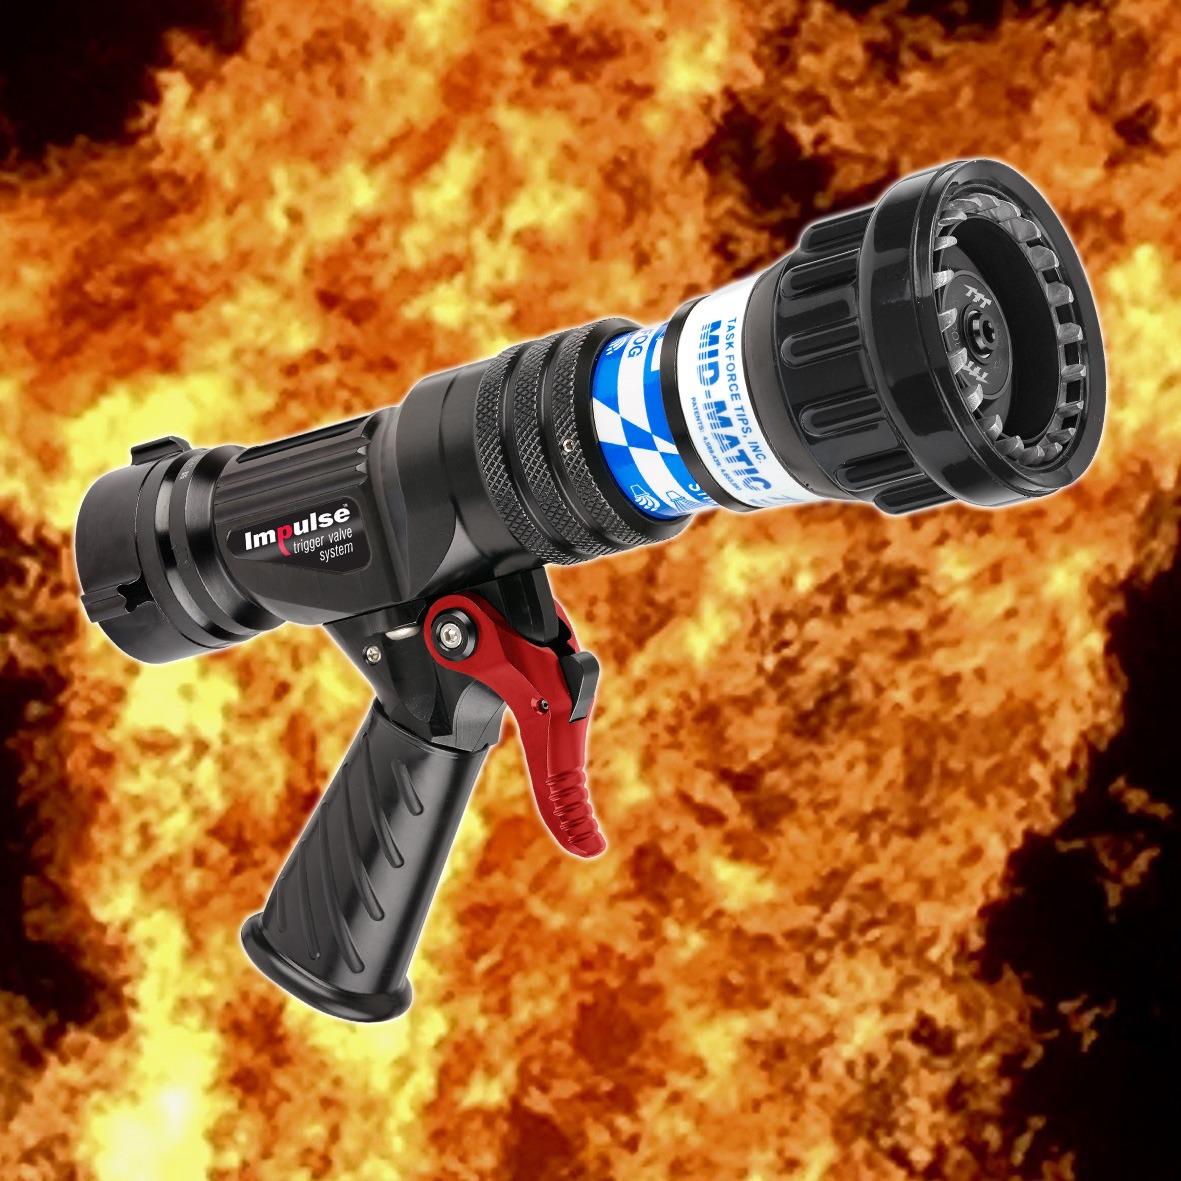 MidMatic mit Trigger Ventilsystem